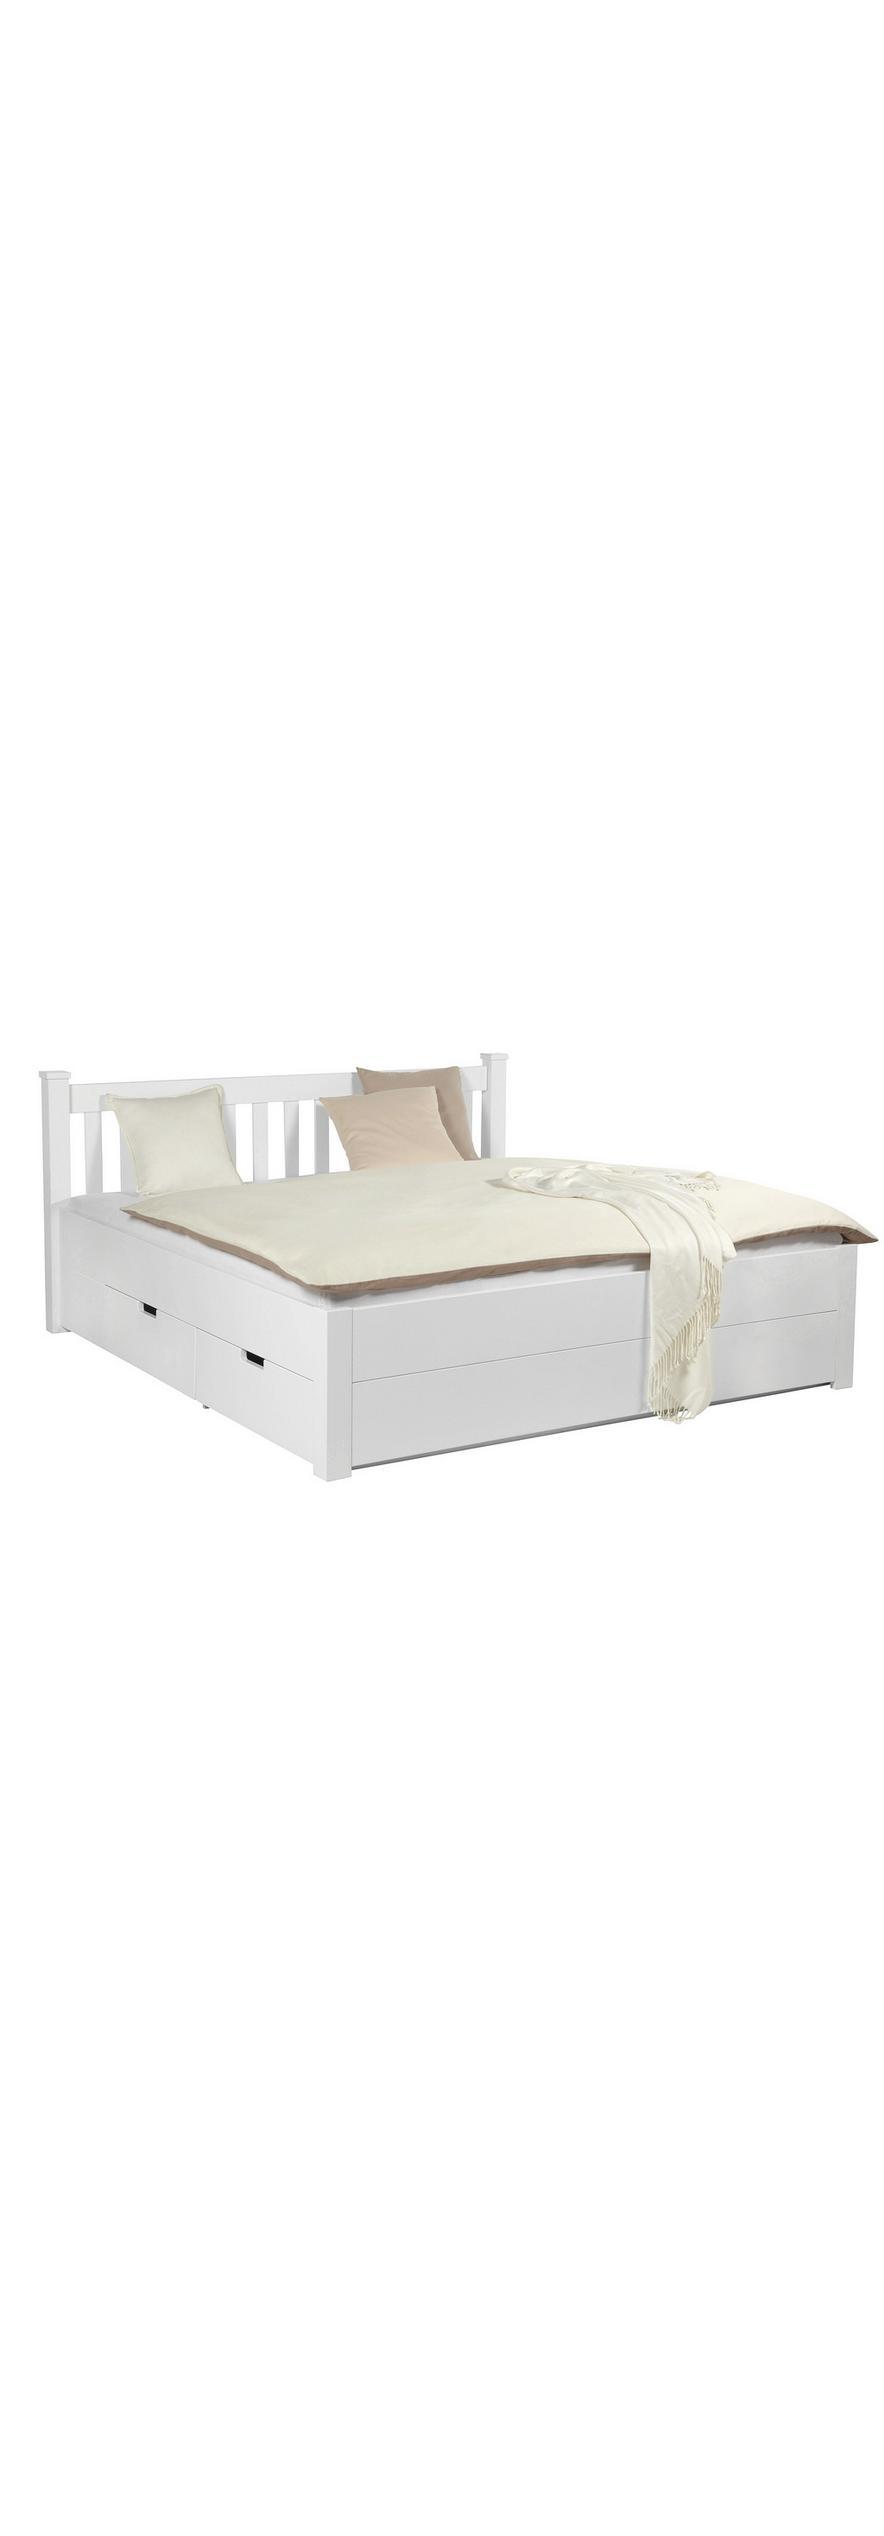 Full Size of Bett In Wei Ca 140x200cm Online Kaufen Mmax Wasser Feng Shui Altes Komplett Leander Luxus Betten Ikea 160x200 Clinique Even Better Foundation Sonoma Eiche Bett Bett Weiss